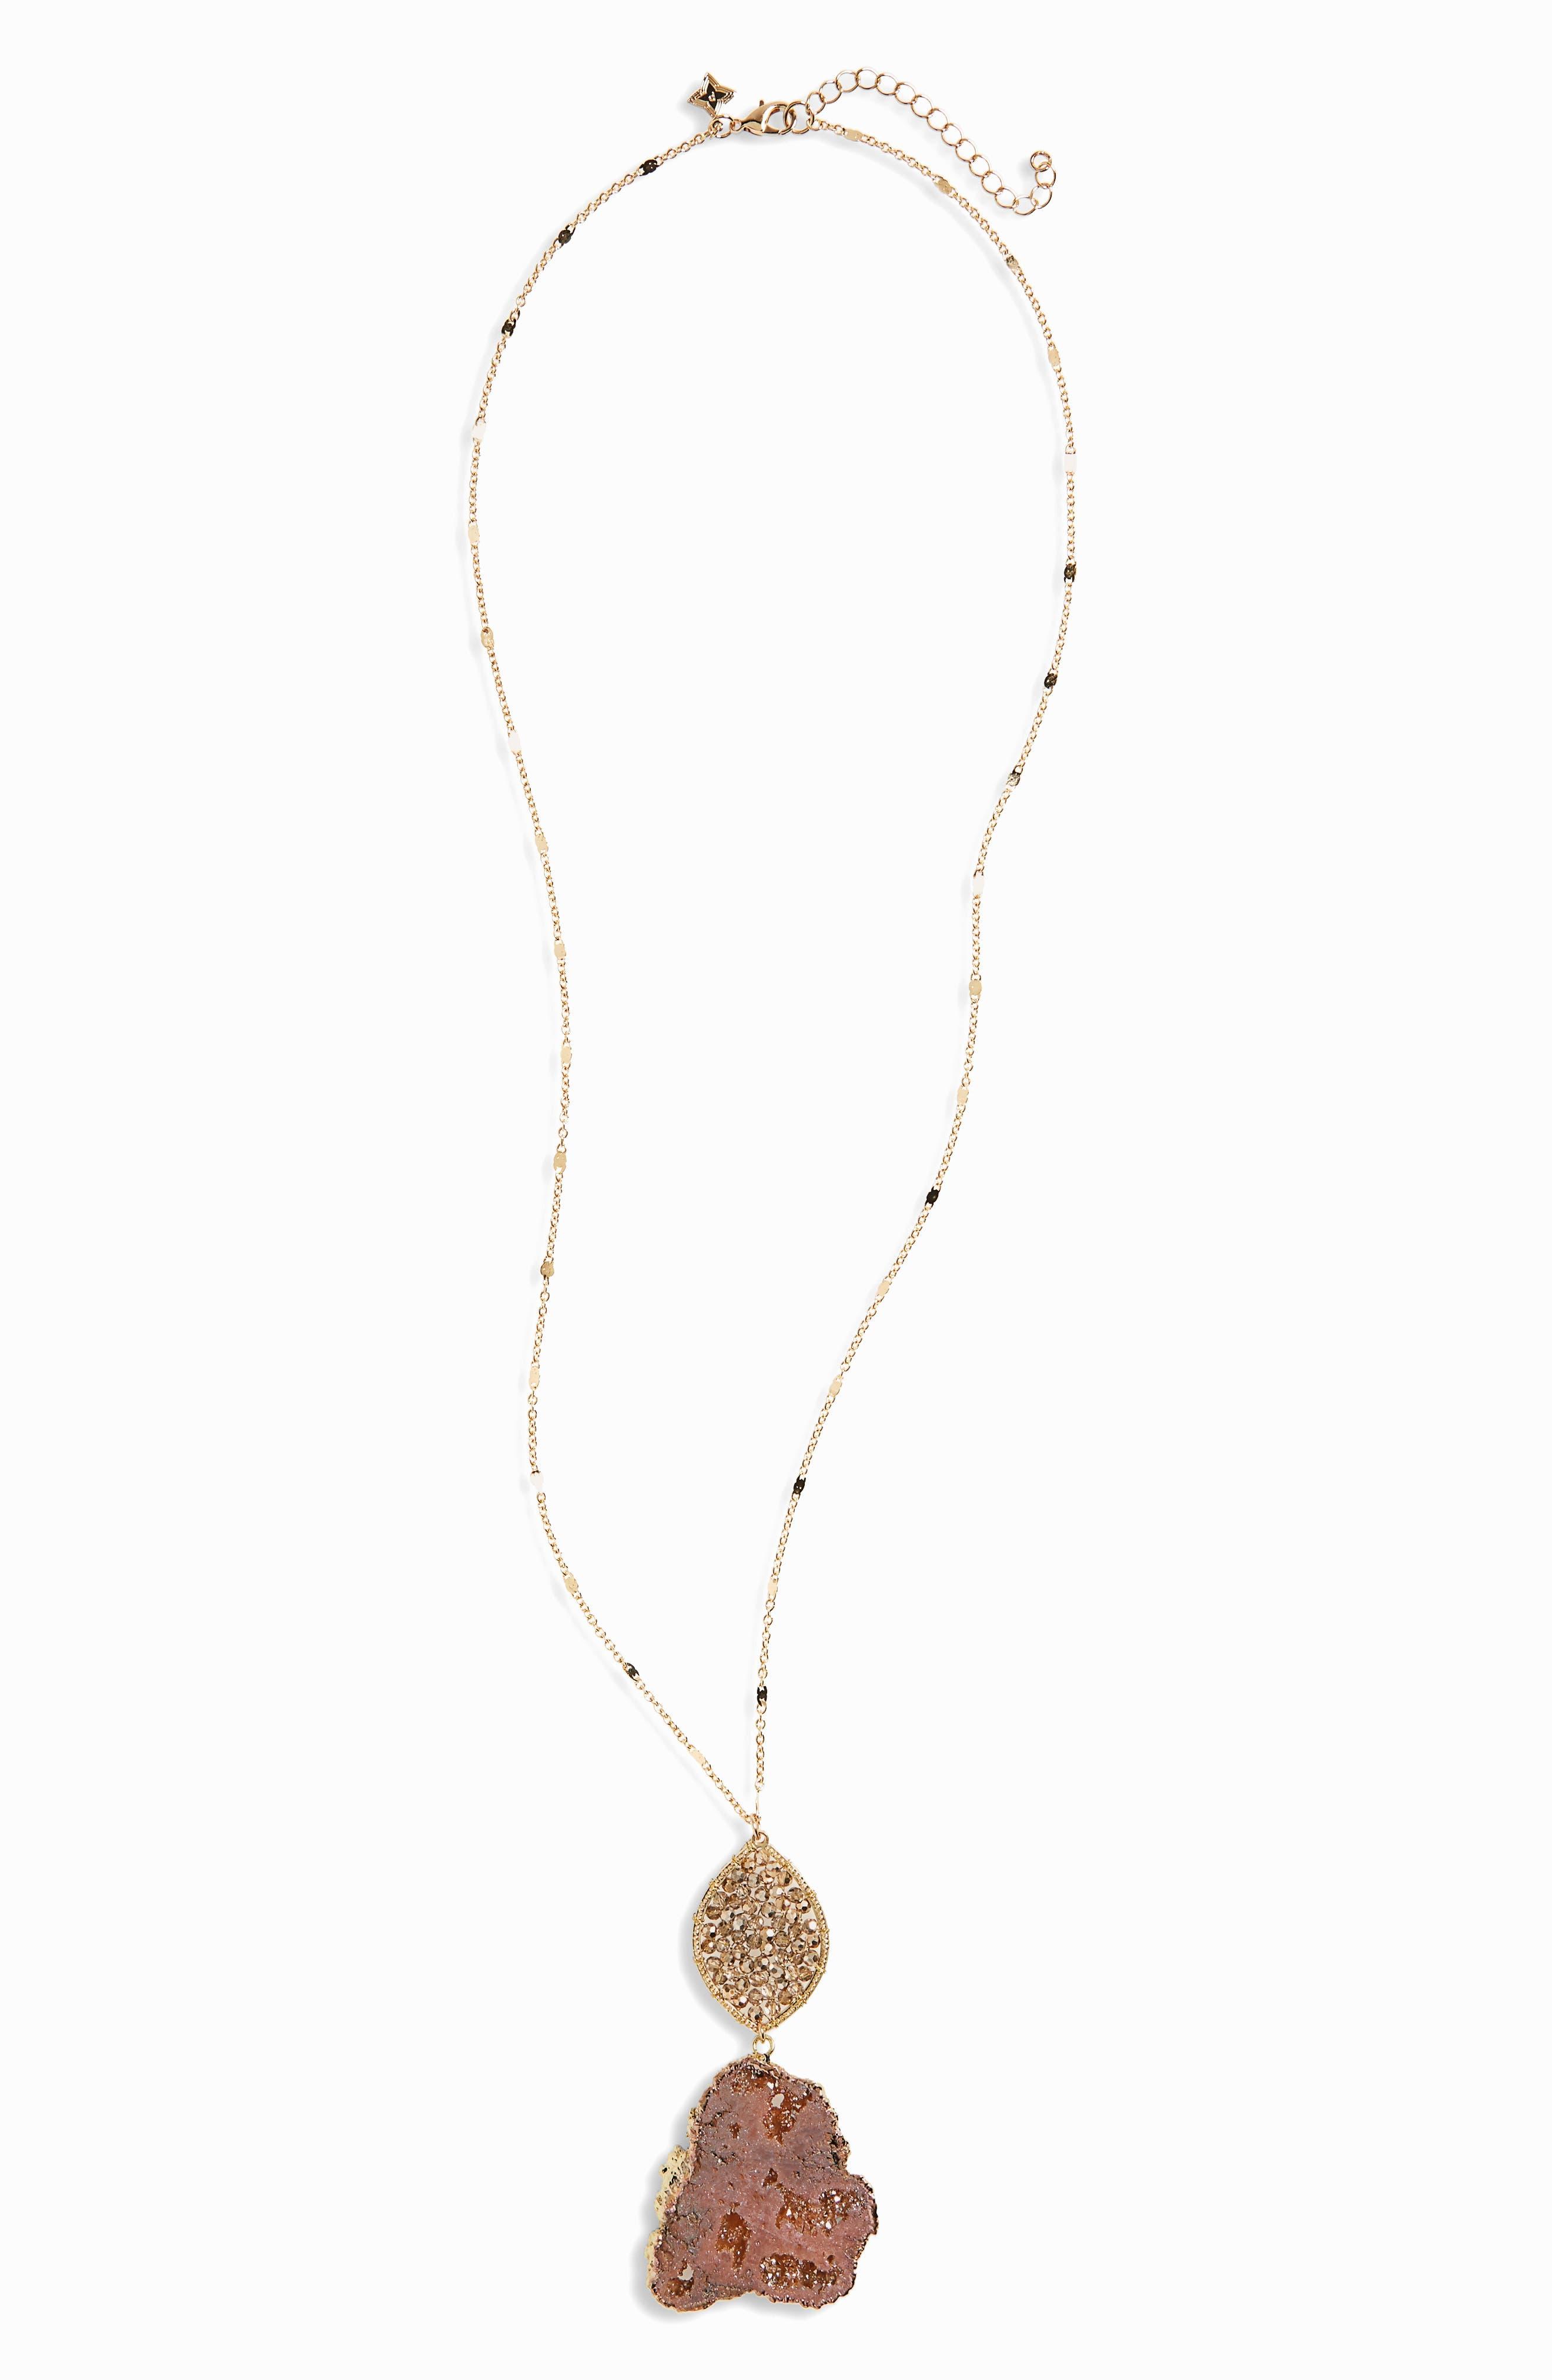 Main Image - Panacea Agate Beaded Pendant Necklace